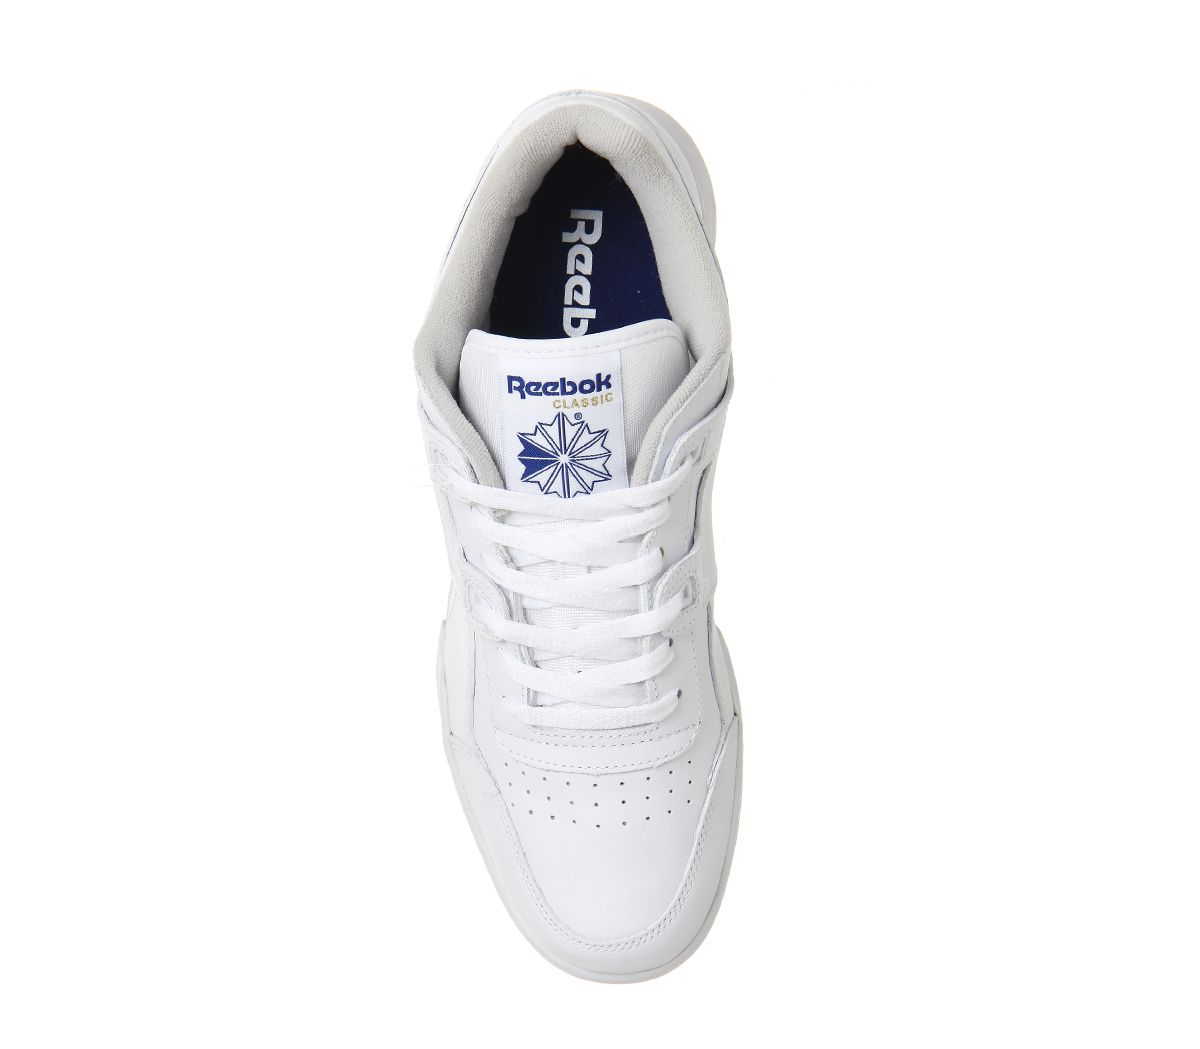 Reebok-Workout-Plus-Blanc-Royal-Baskets-Chaussures miniature 12